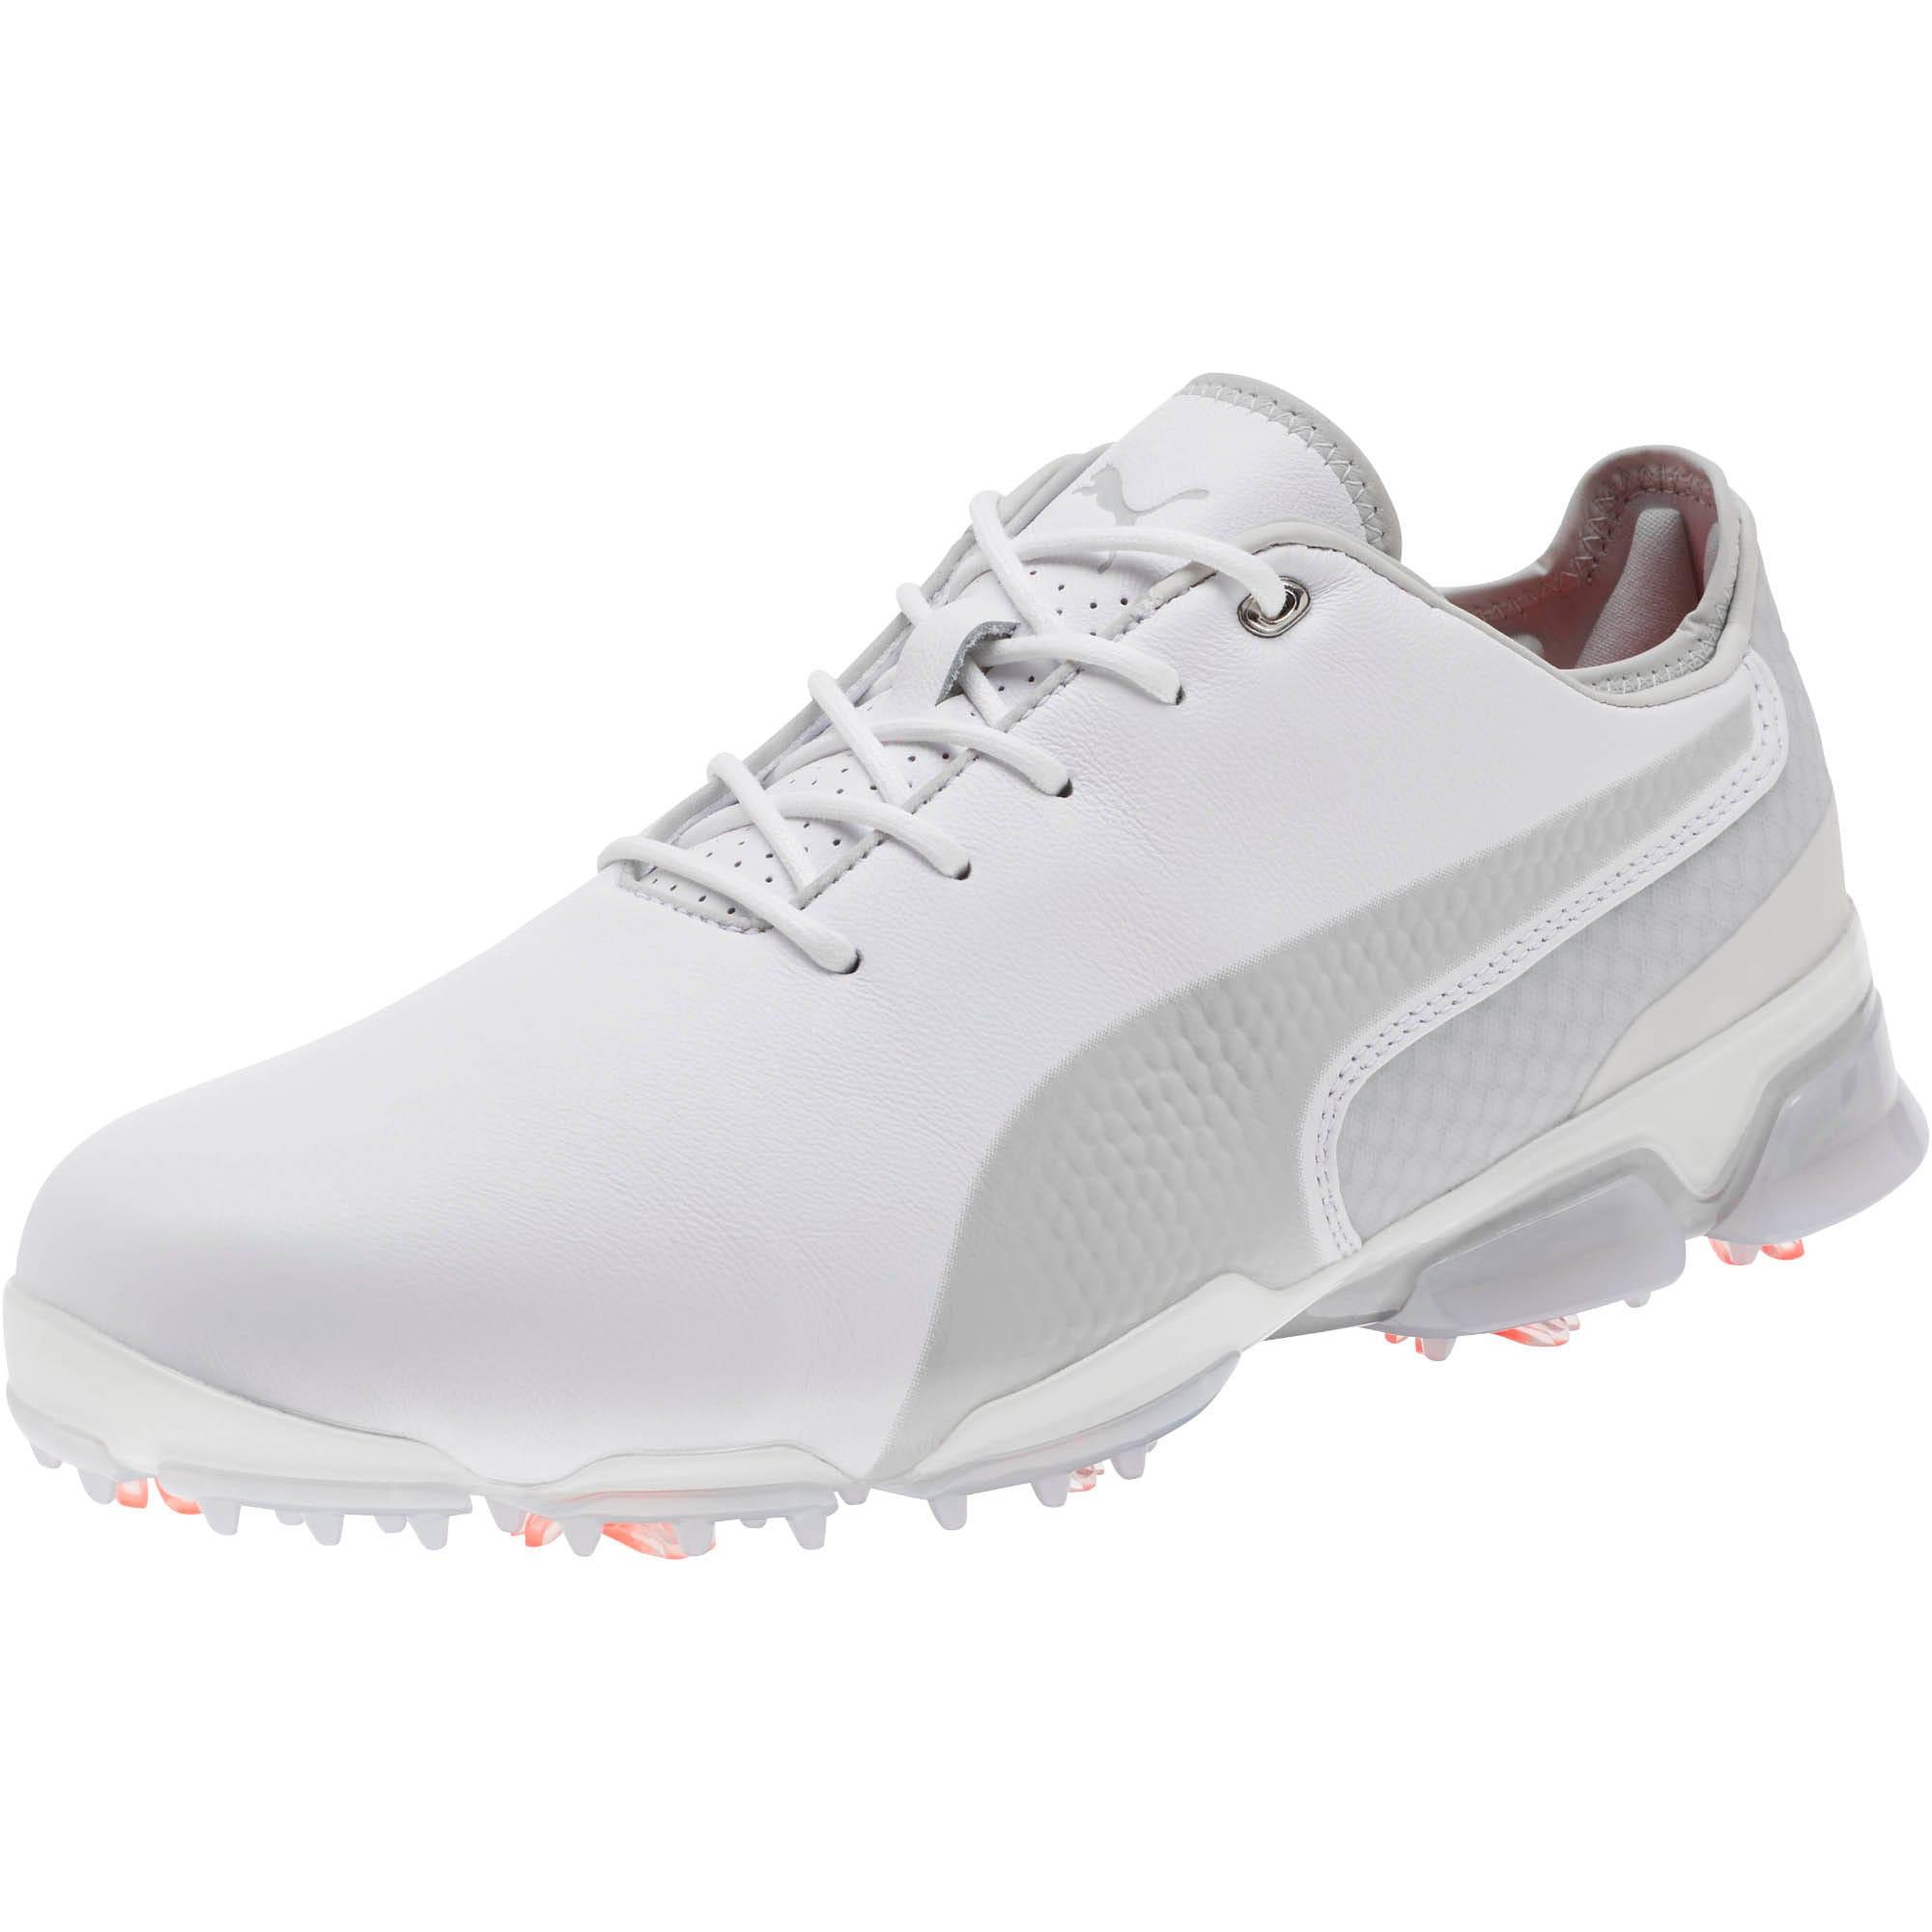 Thumbnail 1 of IGNITE PROADAPT Men's Golf Shoes, White-Gray Violet, medium